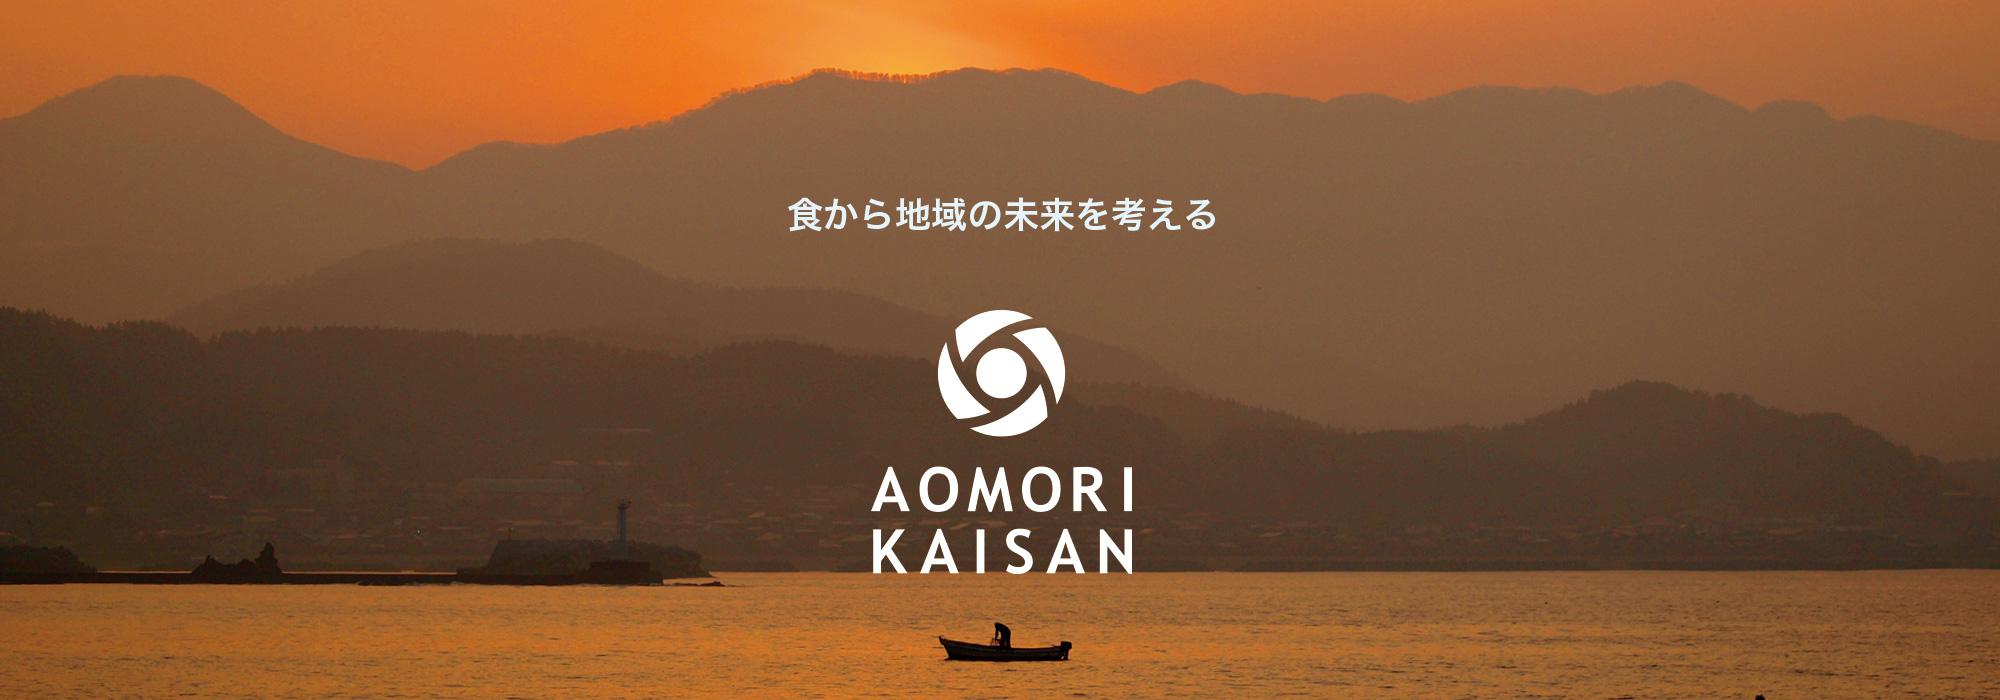 青森県の海産物・水産物・農作物を卸売・加工・販売